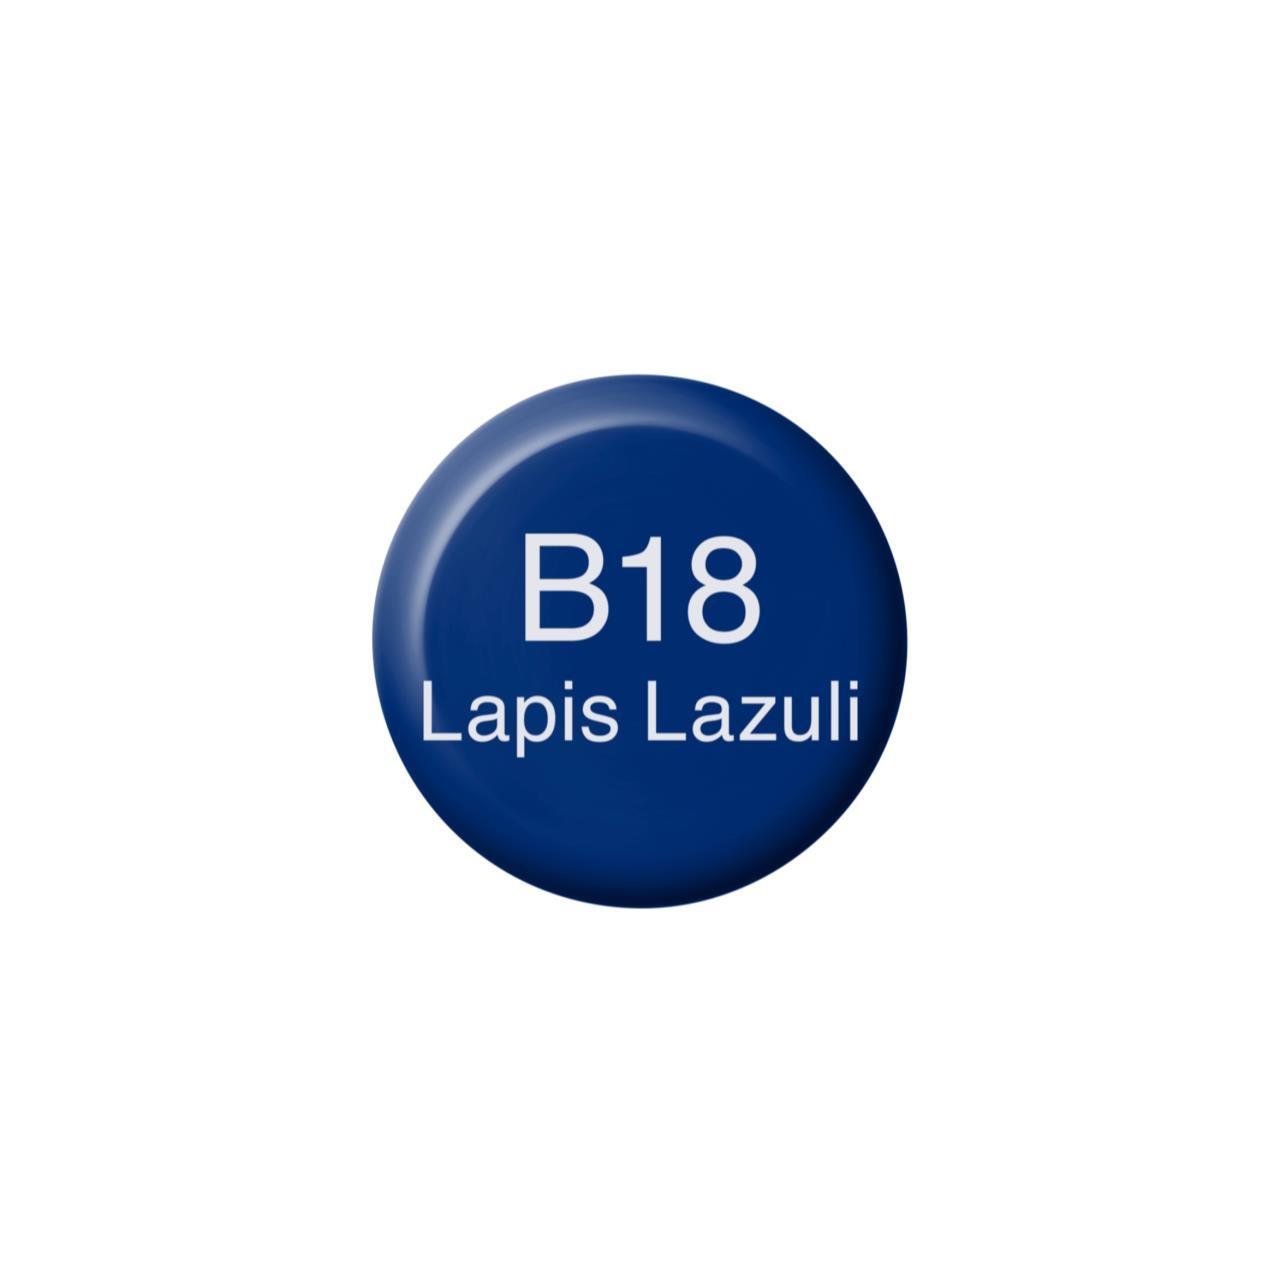 B18 Lapis Lazuli, Copic Ink - 4511338055915